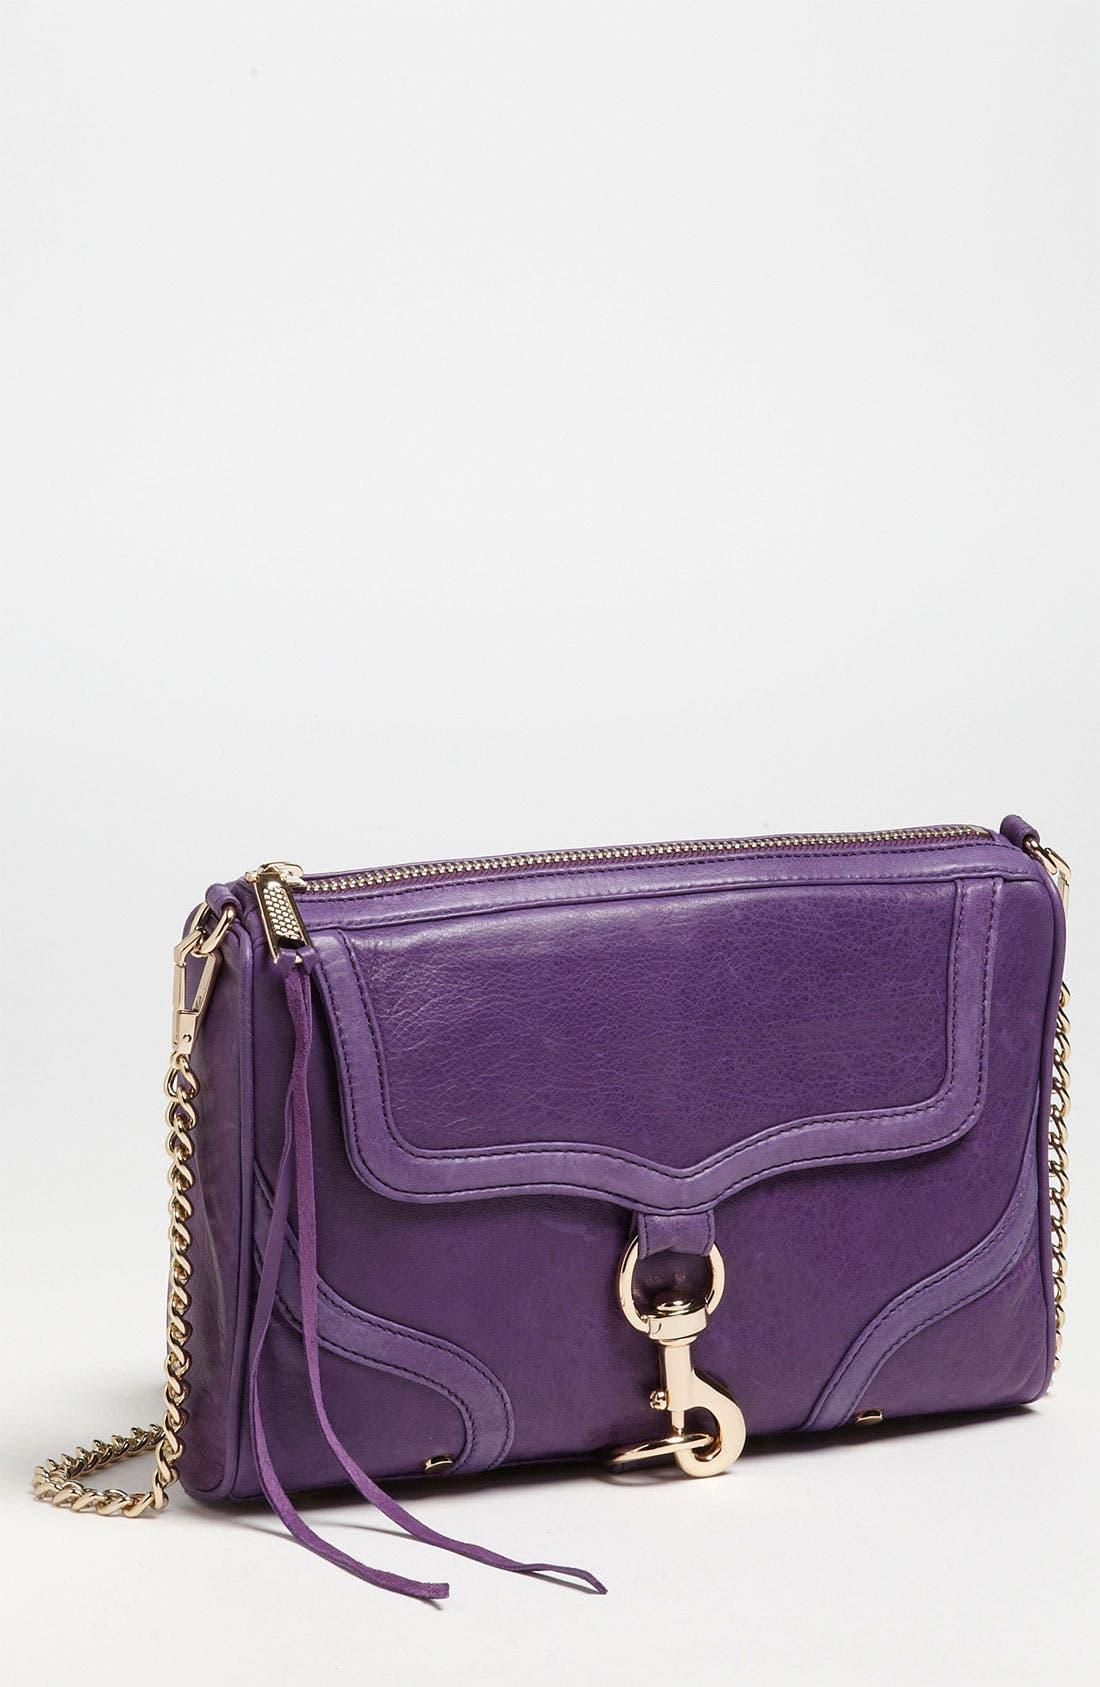 'MAC Bombe' Shoulder Bag,                         Main,                         color, 520